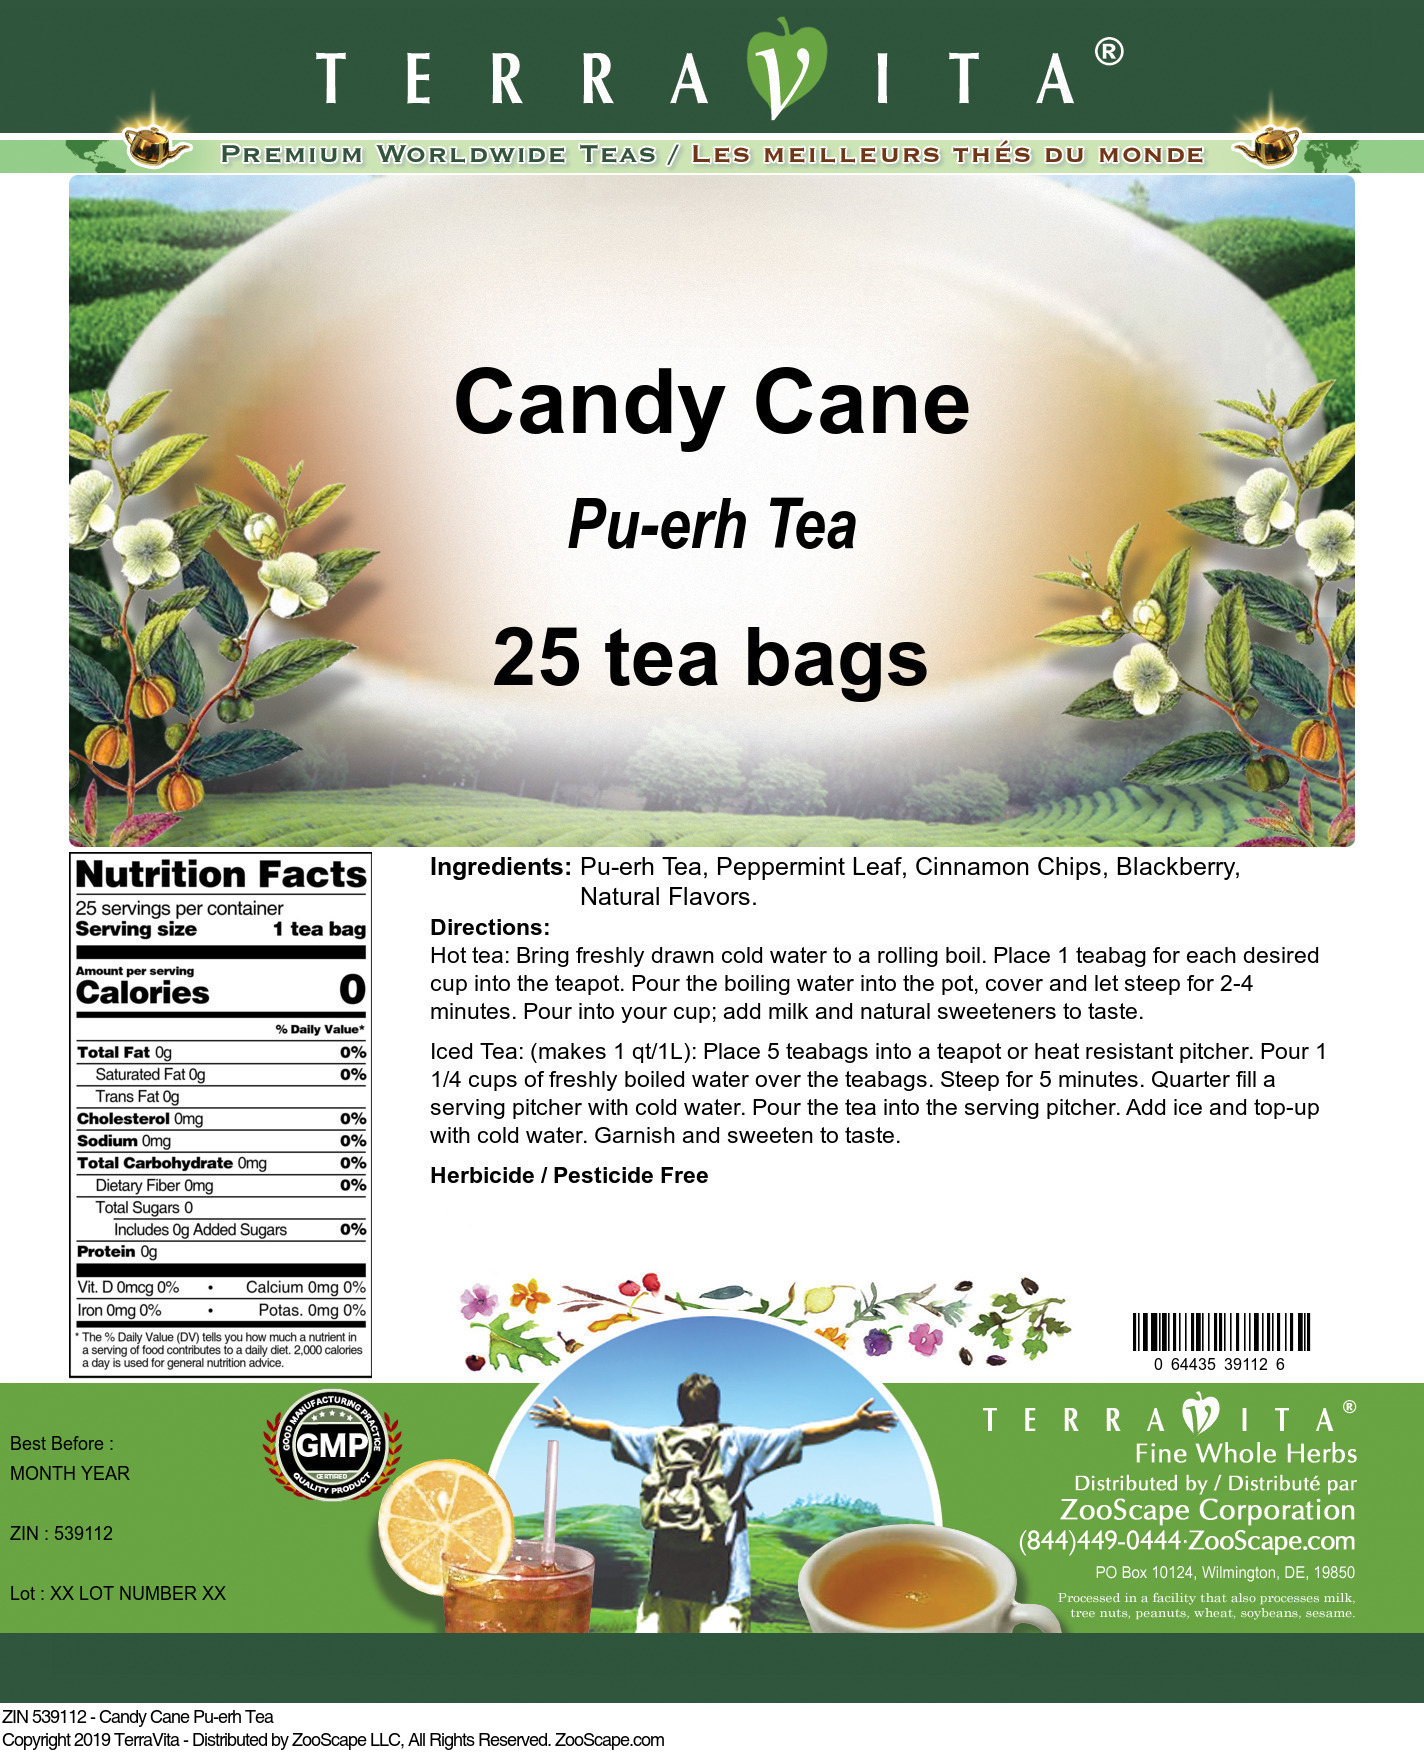 Candy Cane Pu-erh Tea